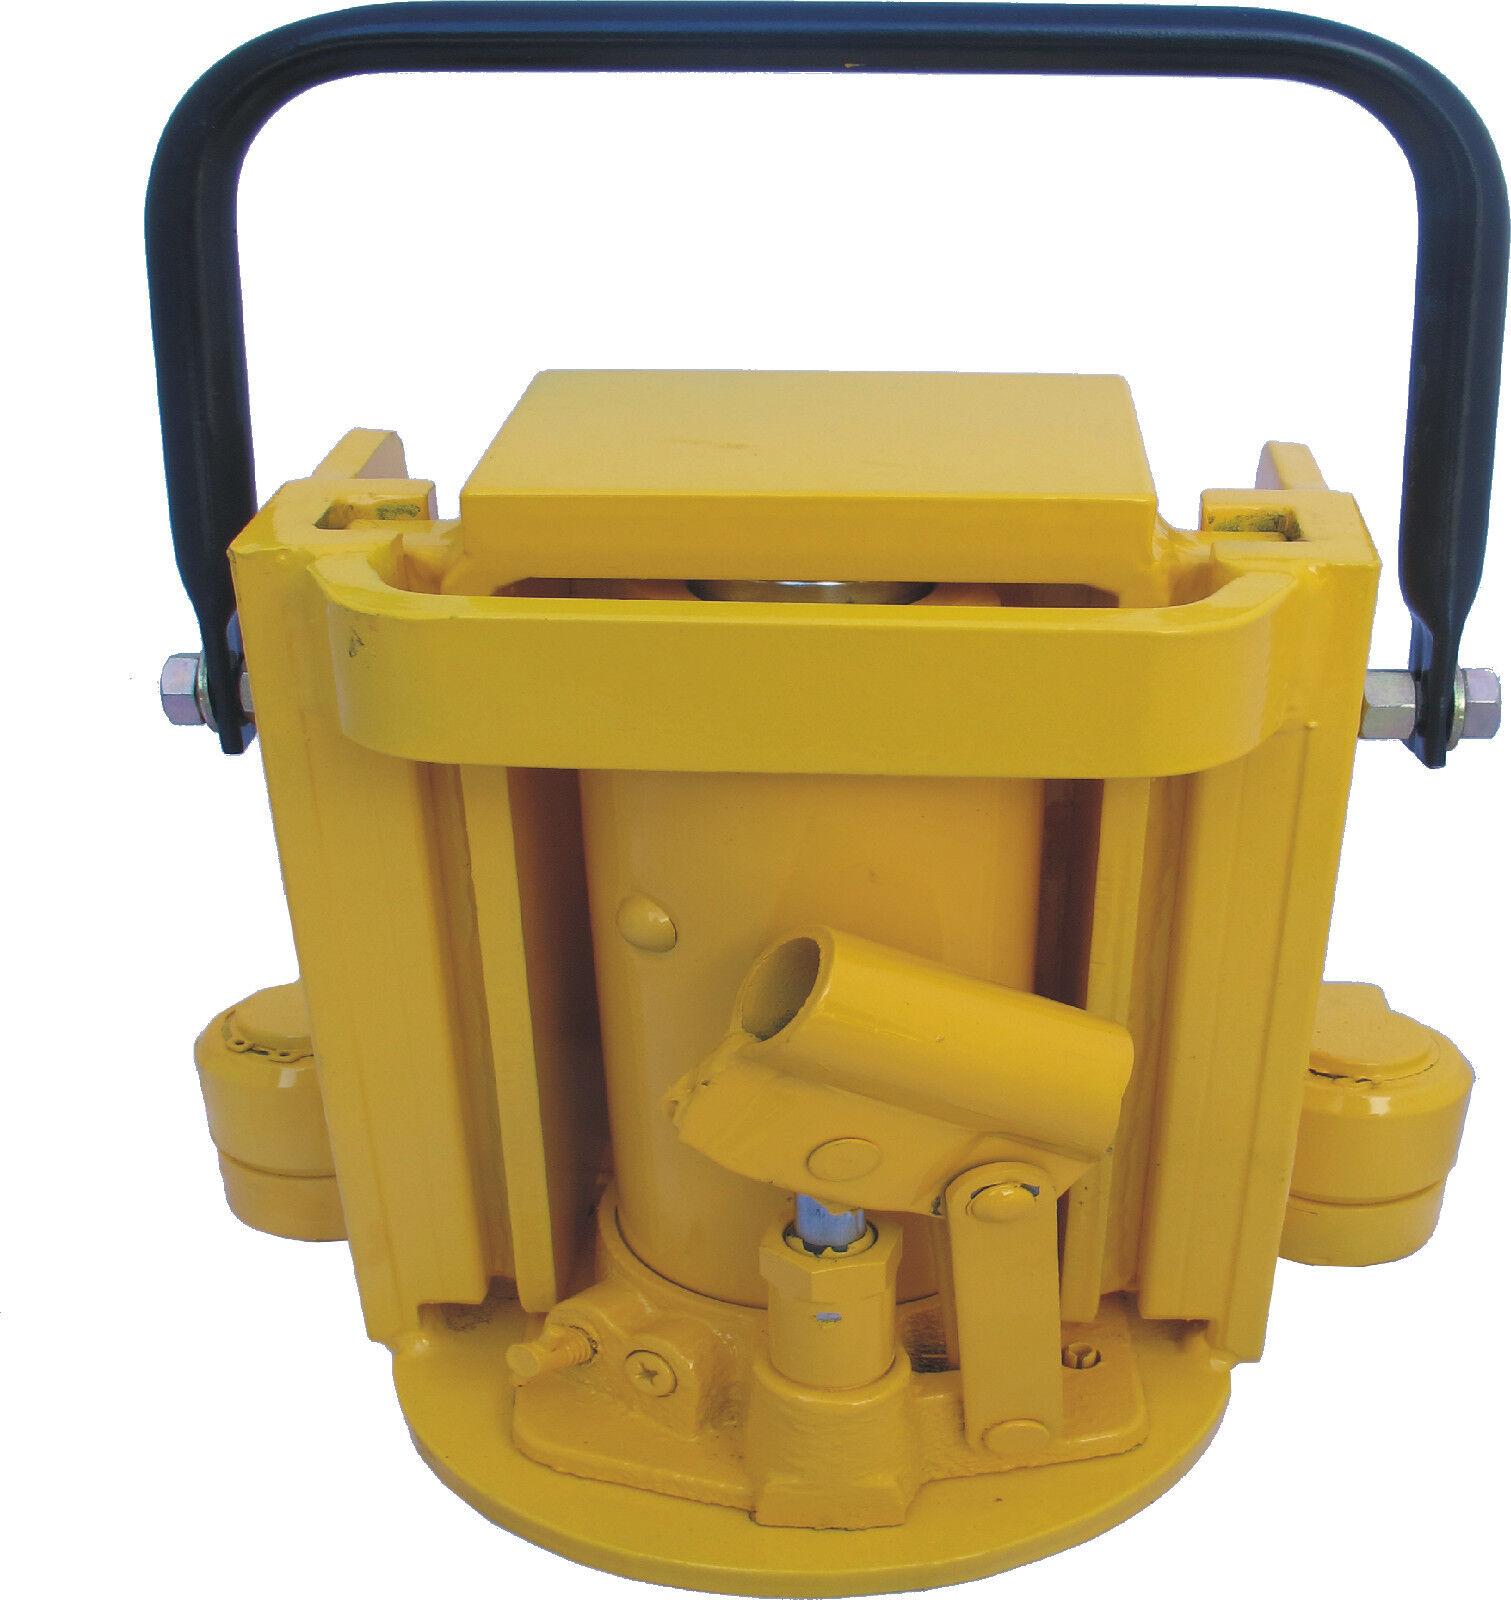 Schwerlastheber Maschinenheber Hydraulikheber Hublast 3,0 Tonnen